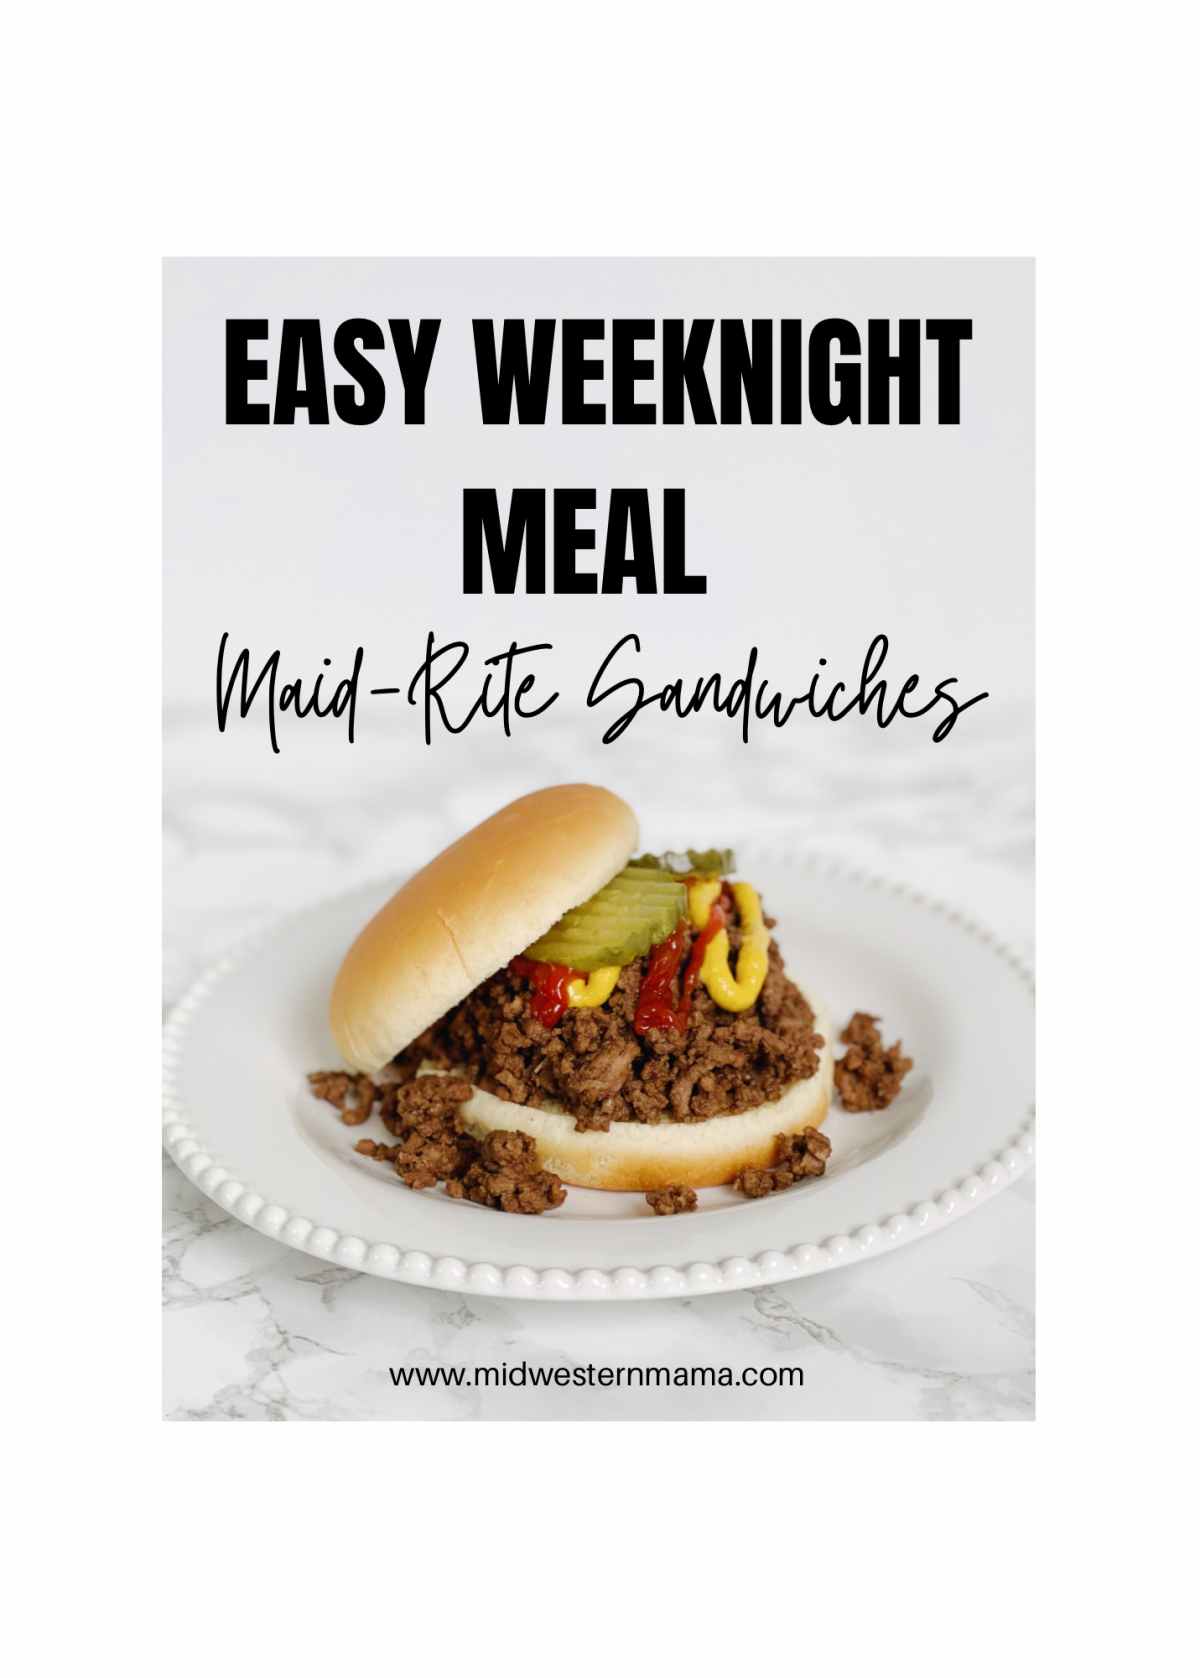 Maid Rite loose meat sandwich recipe